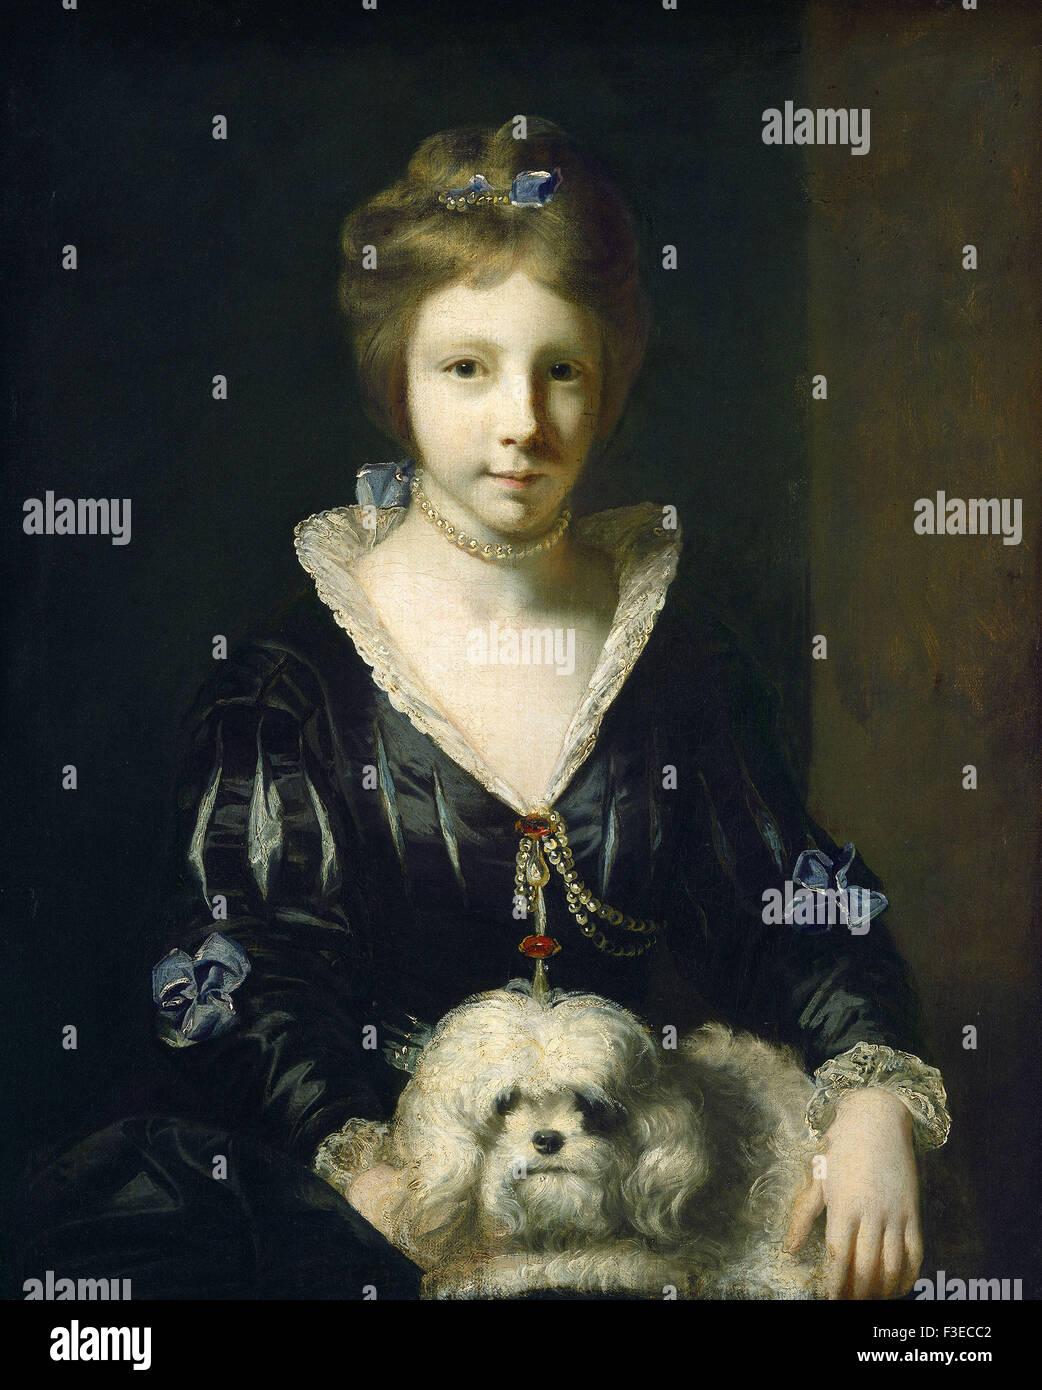 Sir Joshua Reynolds - Miss Beatrix Lister - Stock Image